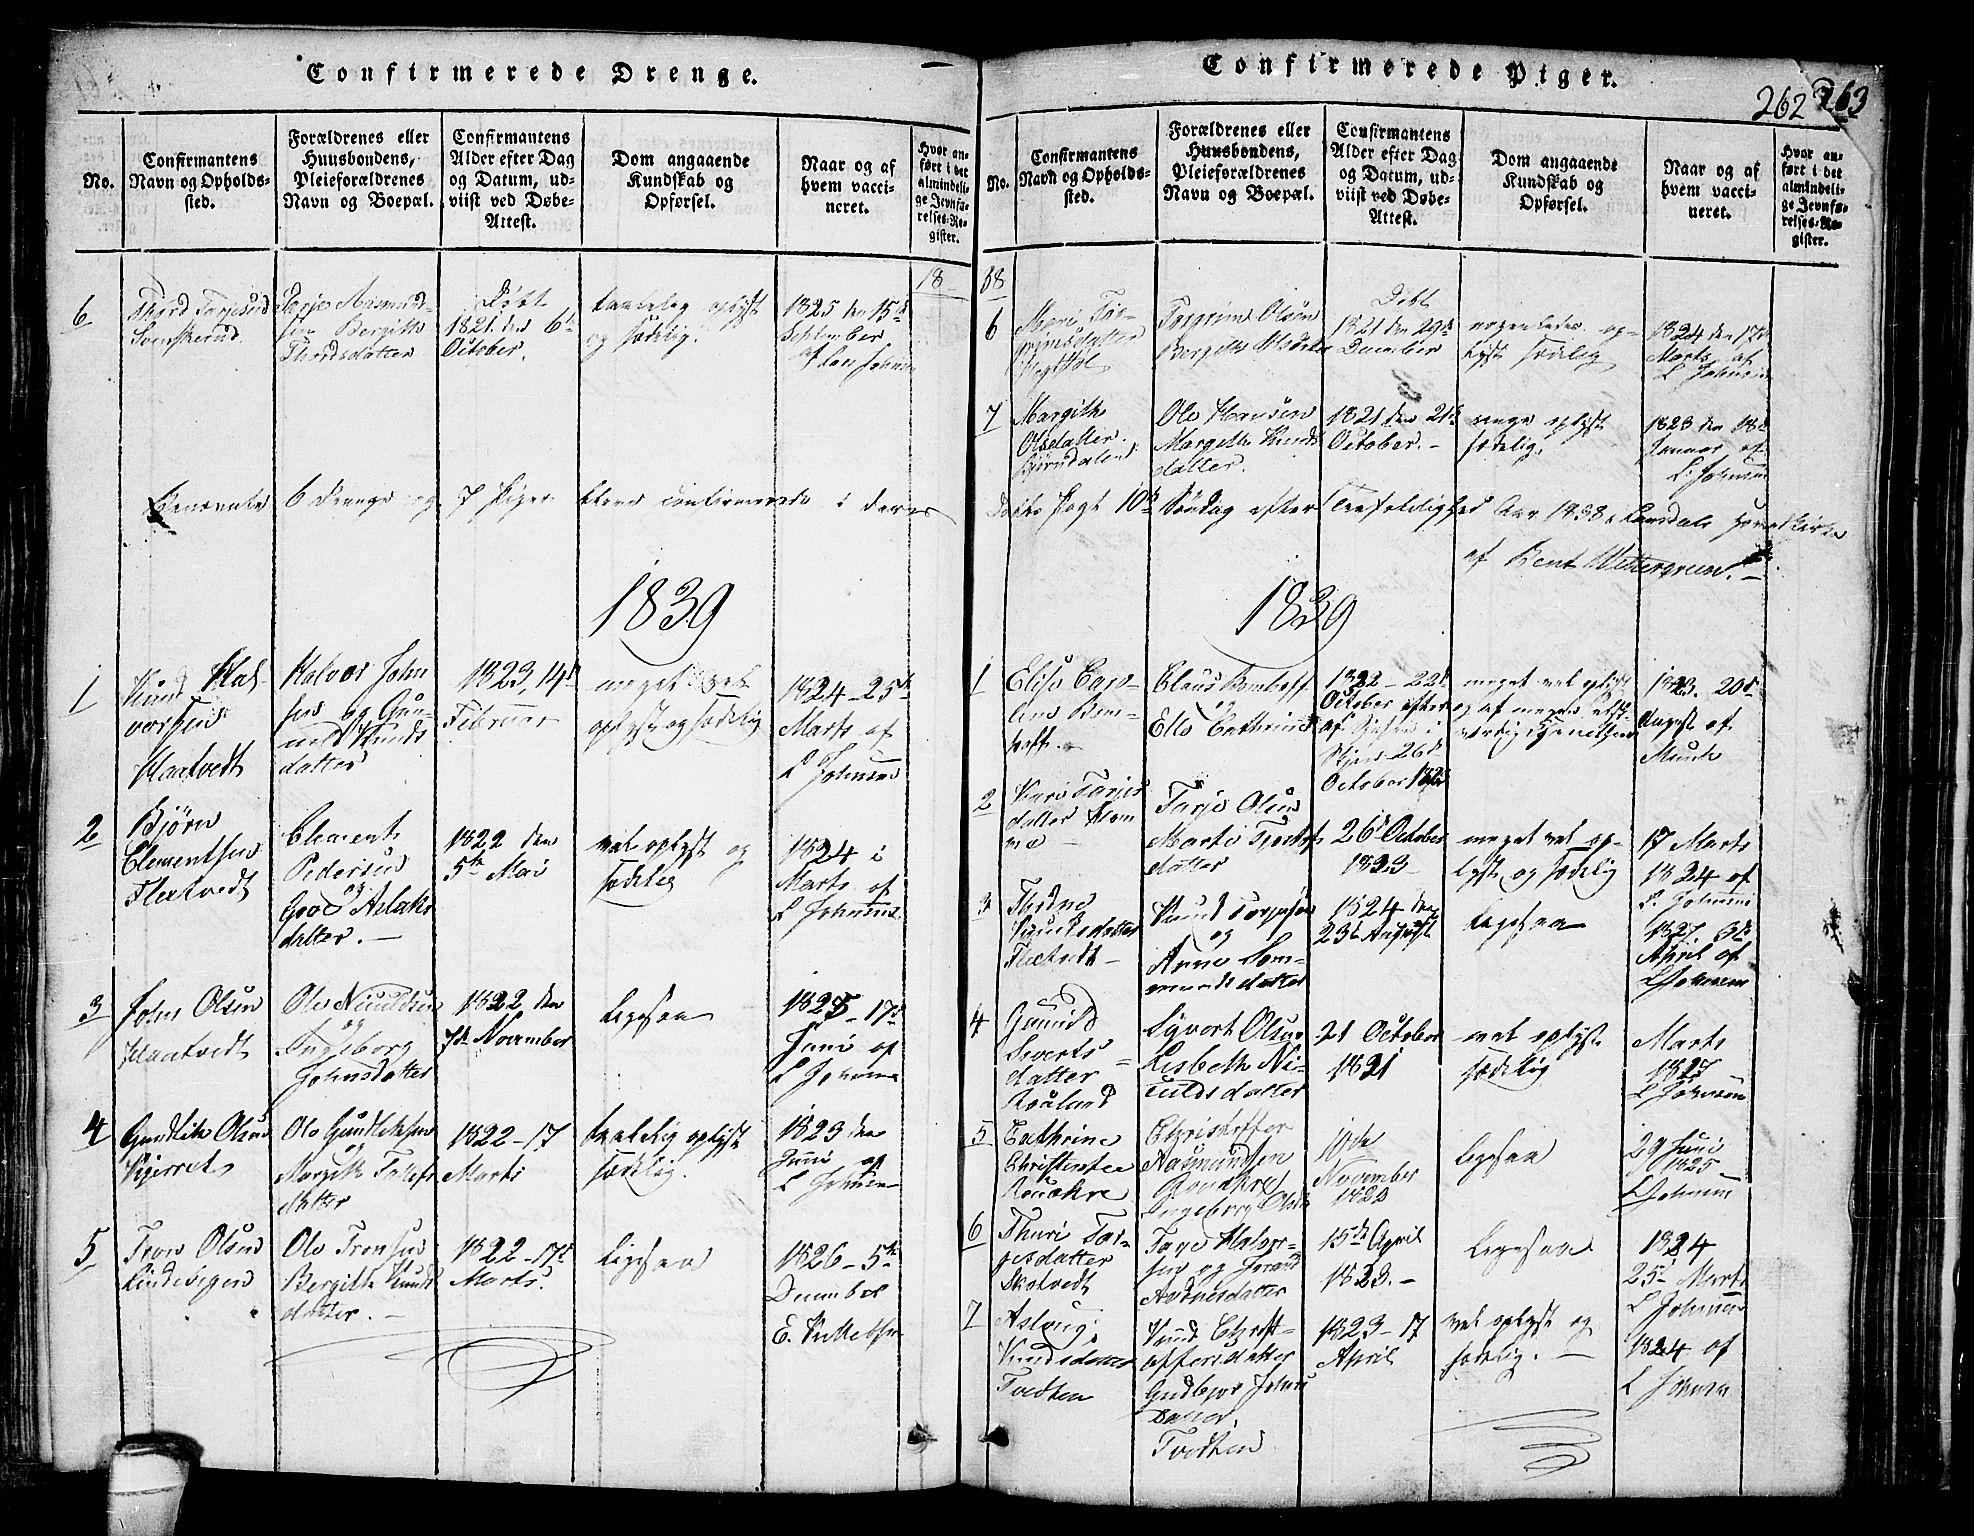 SAKO, Lårdal kirkebøker, G/Ga/L0001: Klokkerbok nr. I 1, 1815-1861, s. 262